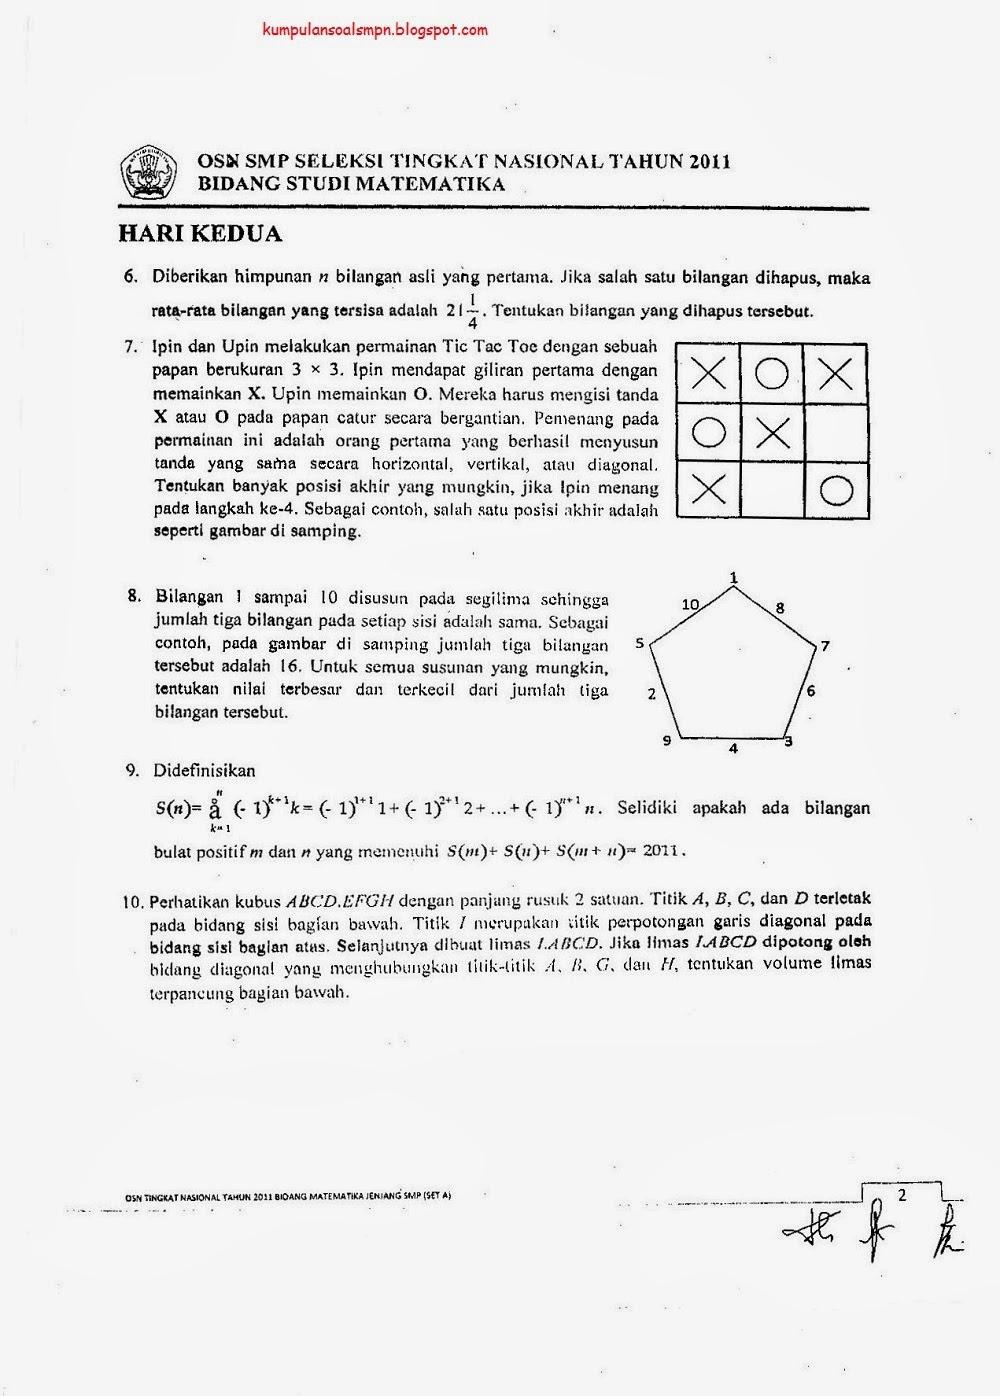 Kumpulan Soal Osn Smp Matematika Ta 2011 2012 Kumpulan Soal Dan Prediksi Ujian Nasional Smp